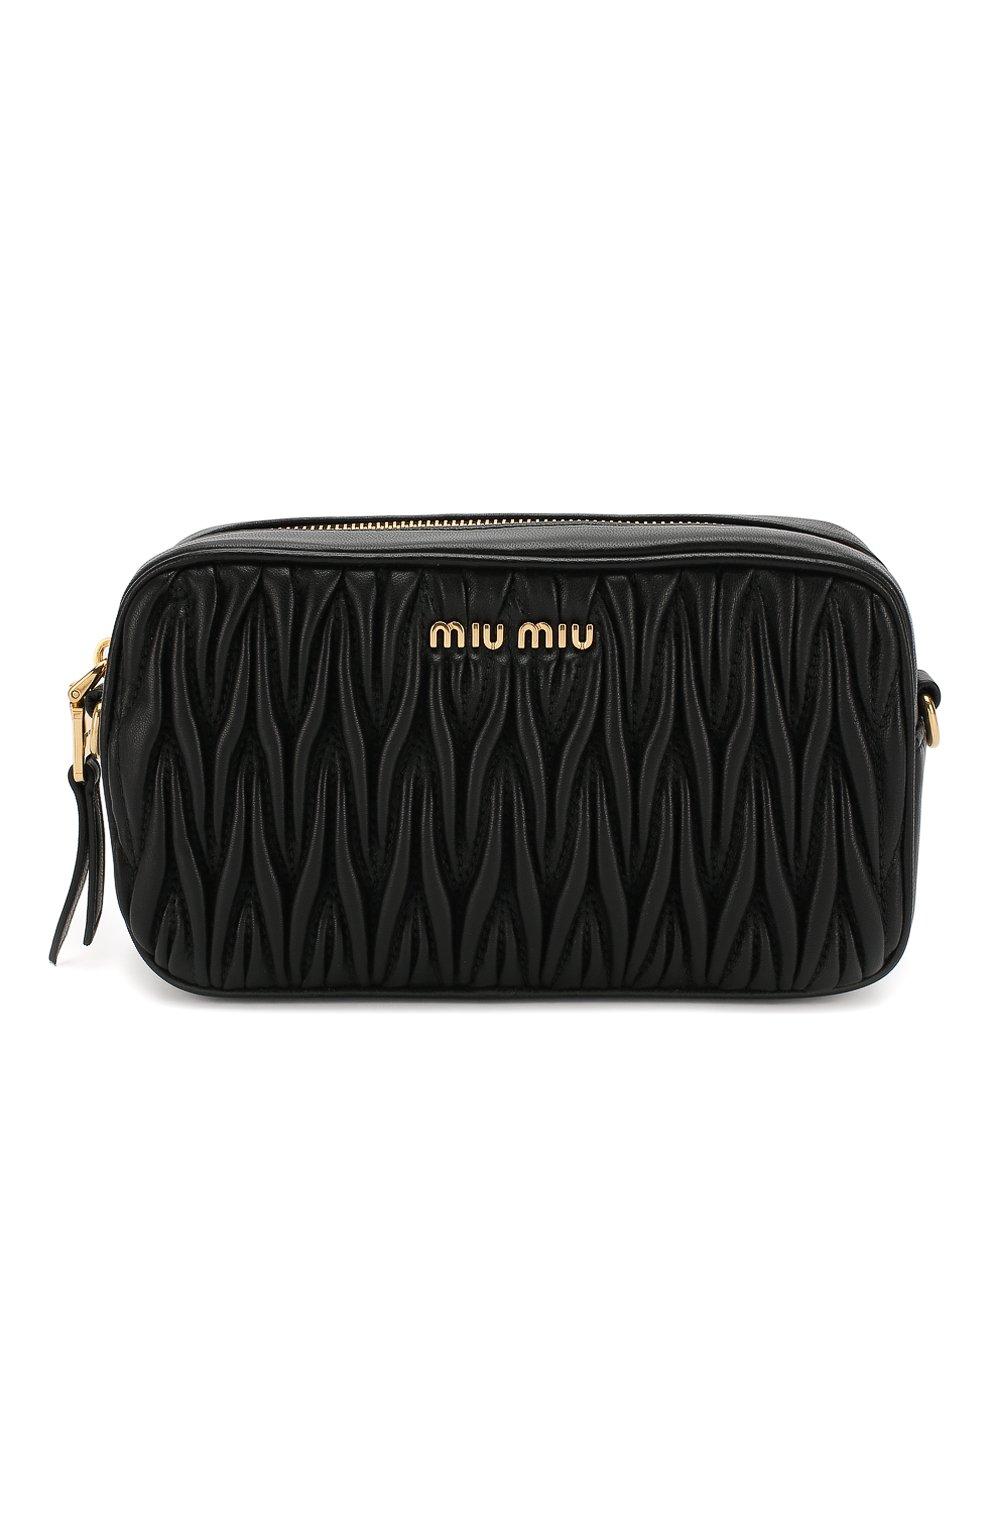 Женская поясная сумка MIU MIU черного цвета, арт. 5BL005-N88-F0002-COO | Фото 1